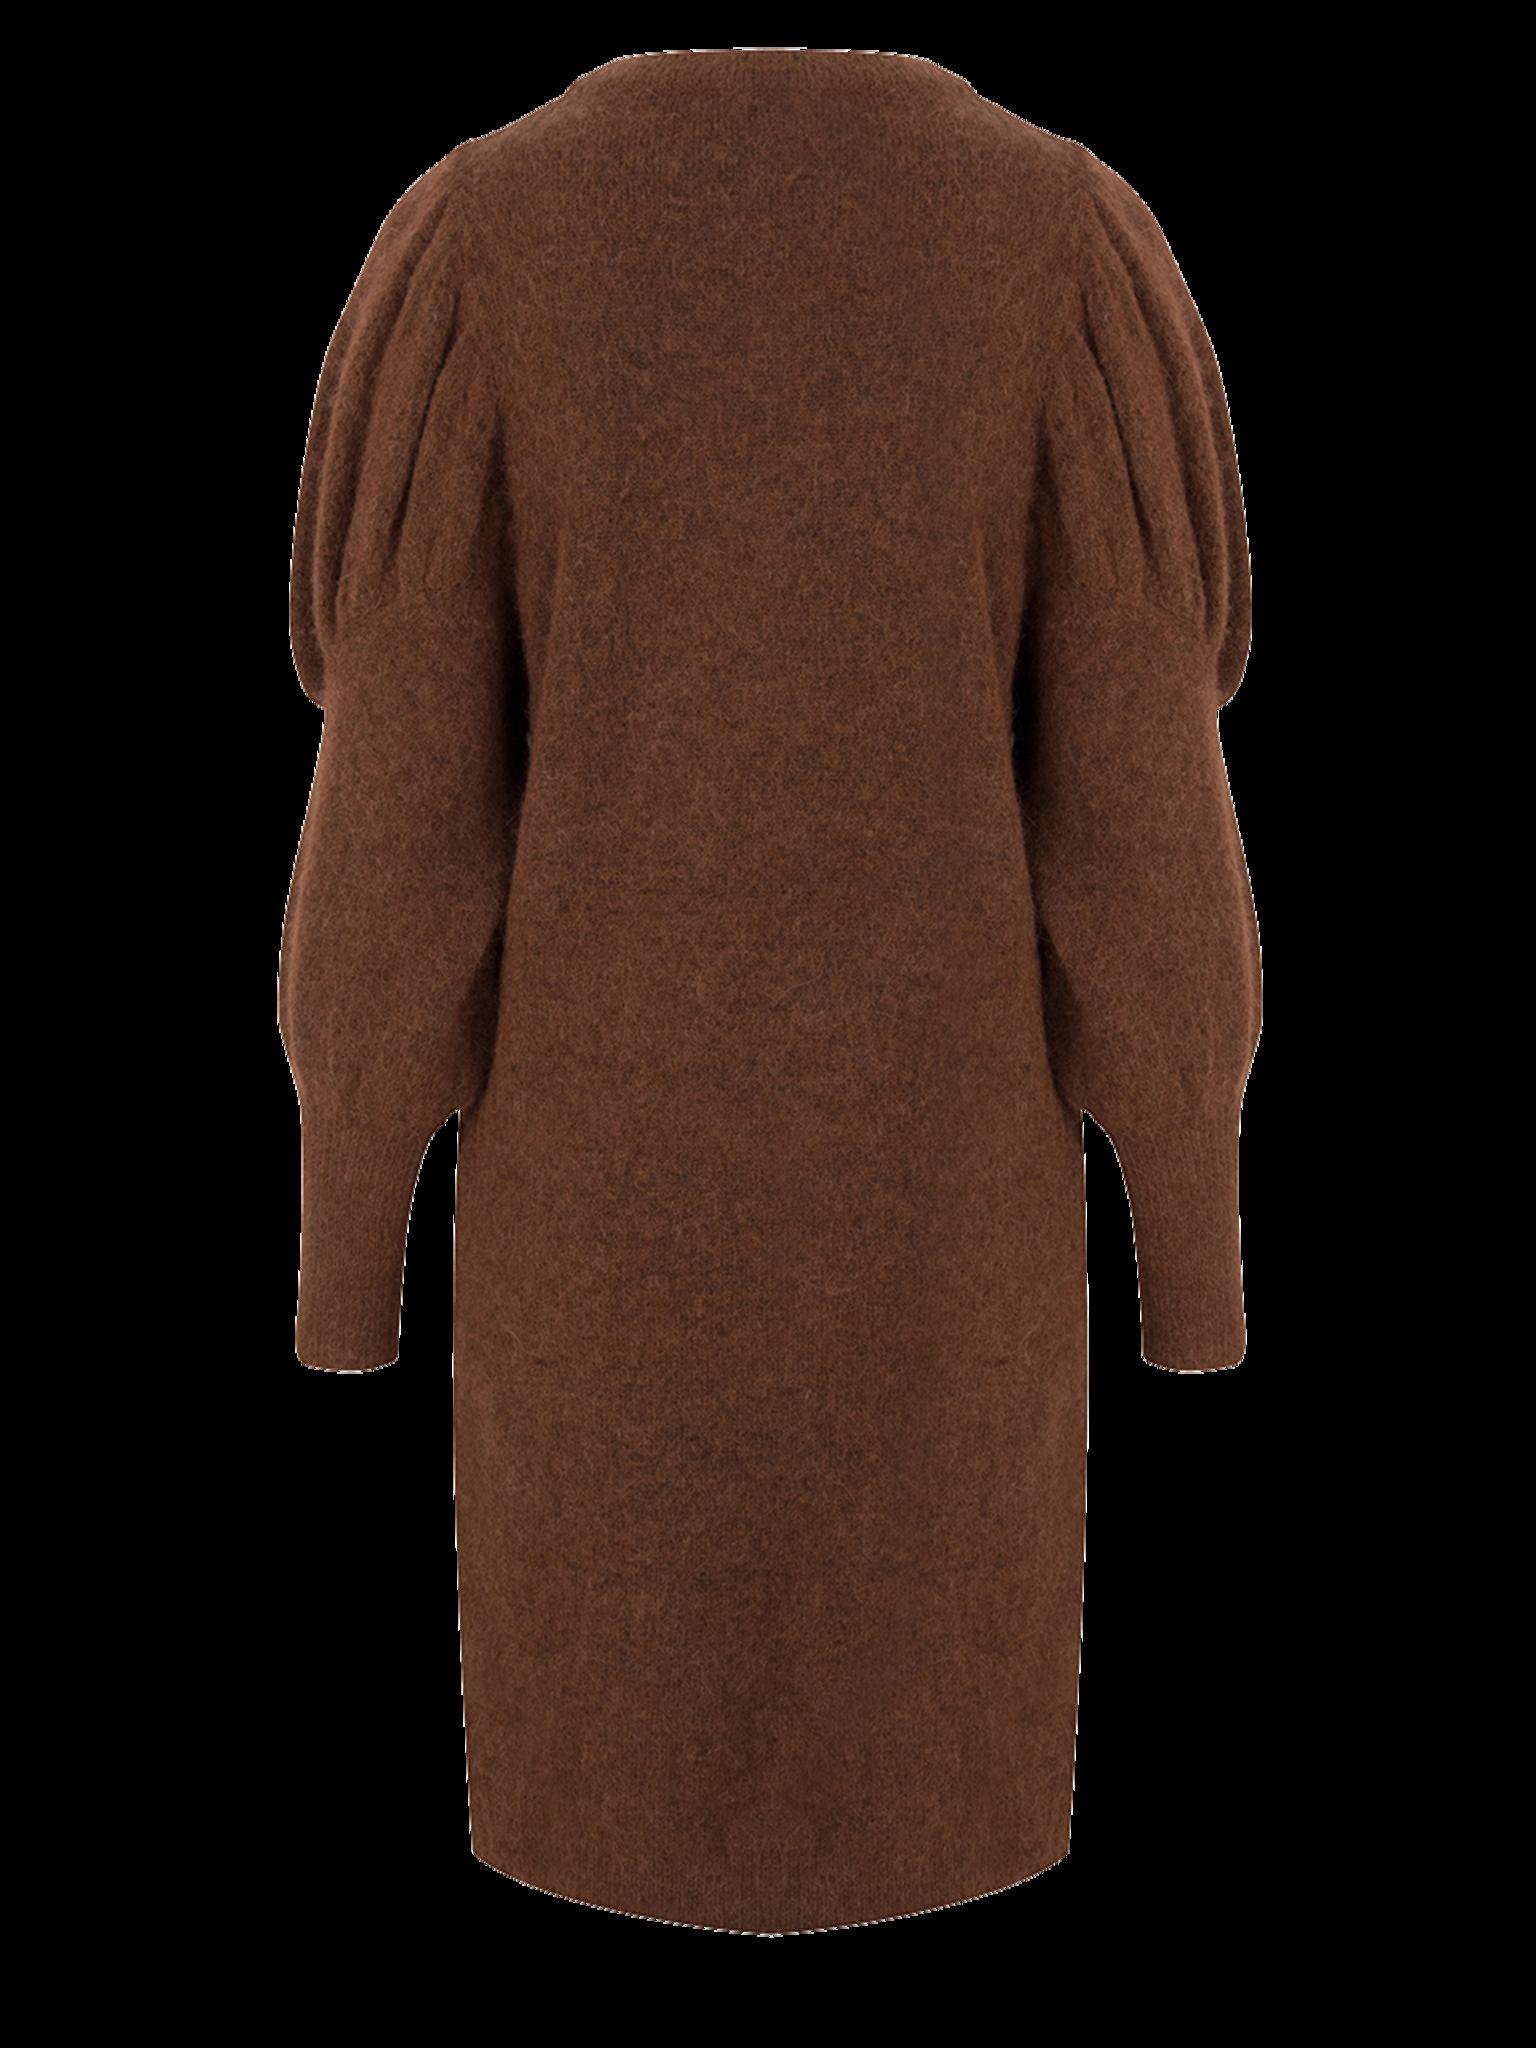 Dante 6 Dress 204415 LITTAL-2